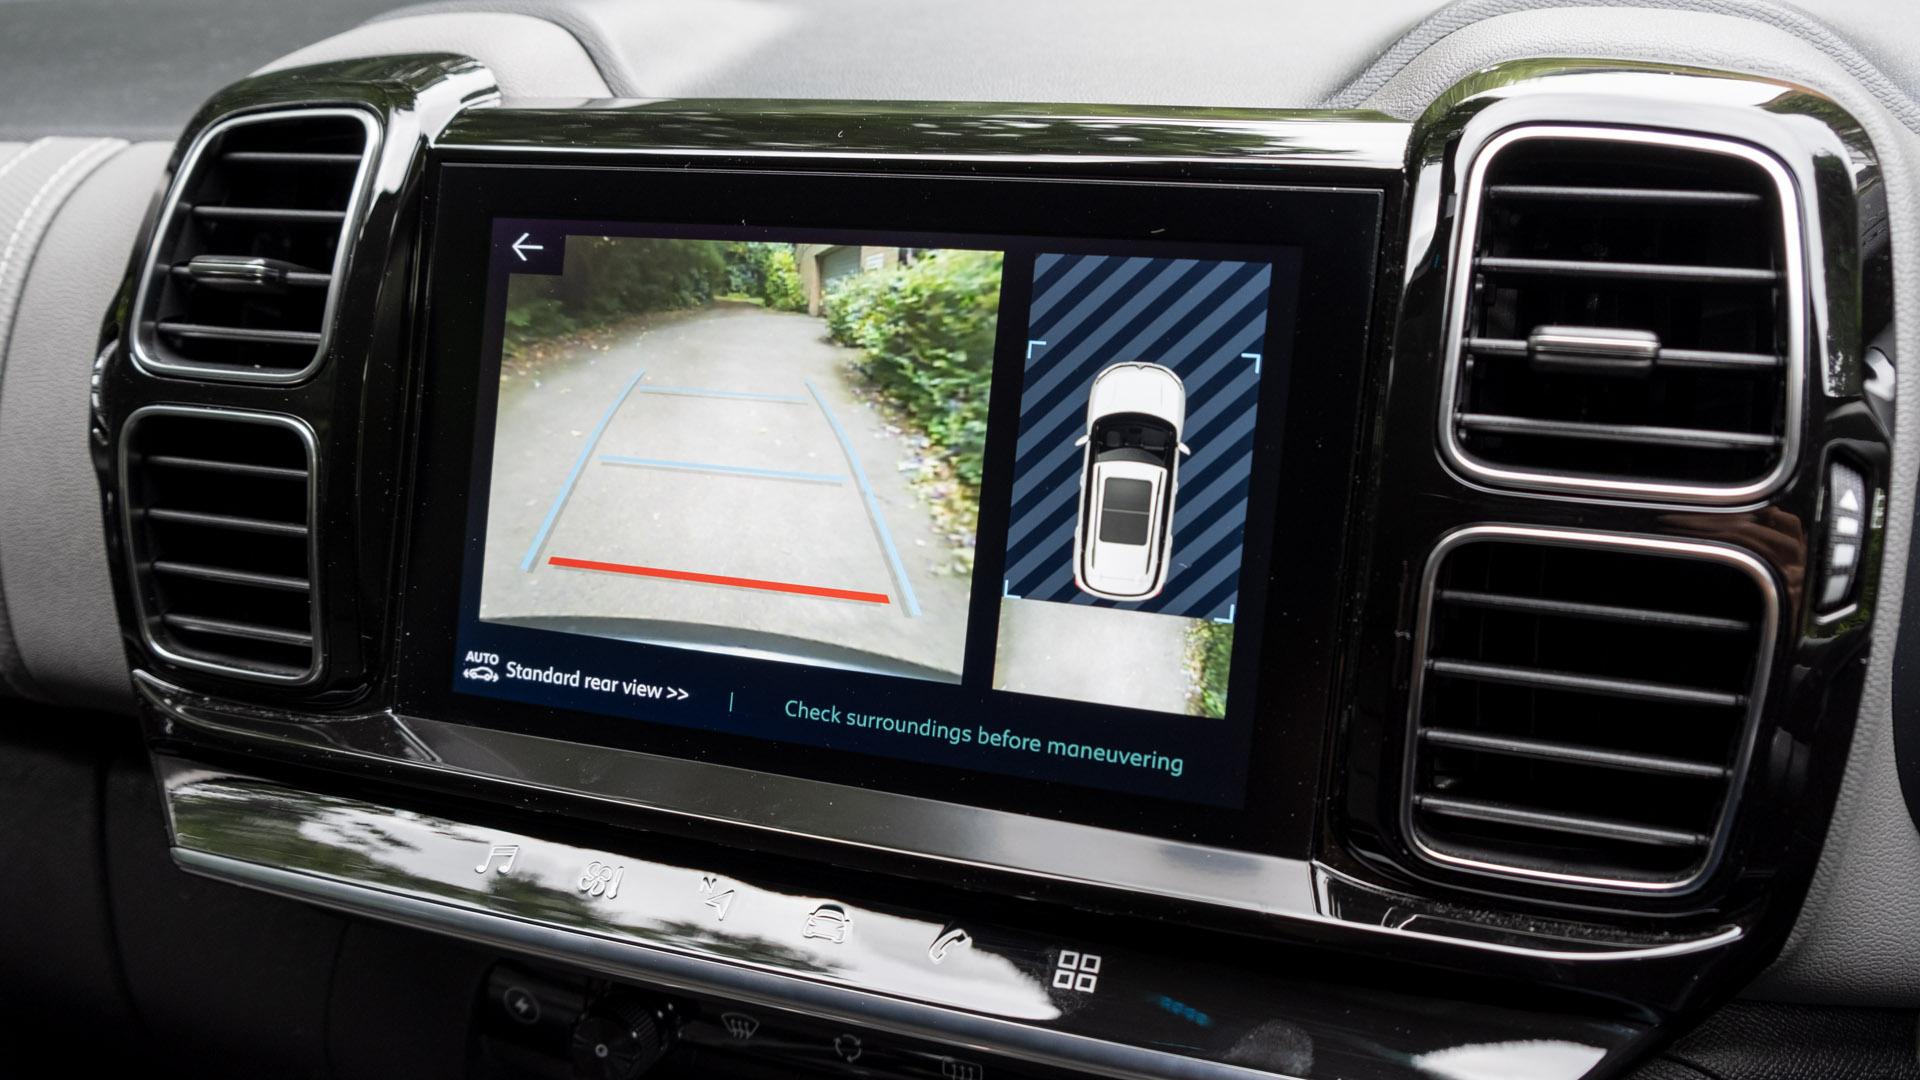 Citroen C5 Aircross Hybrid rearview camera